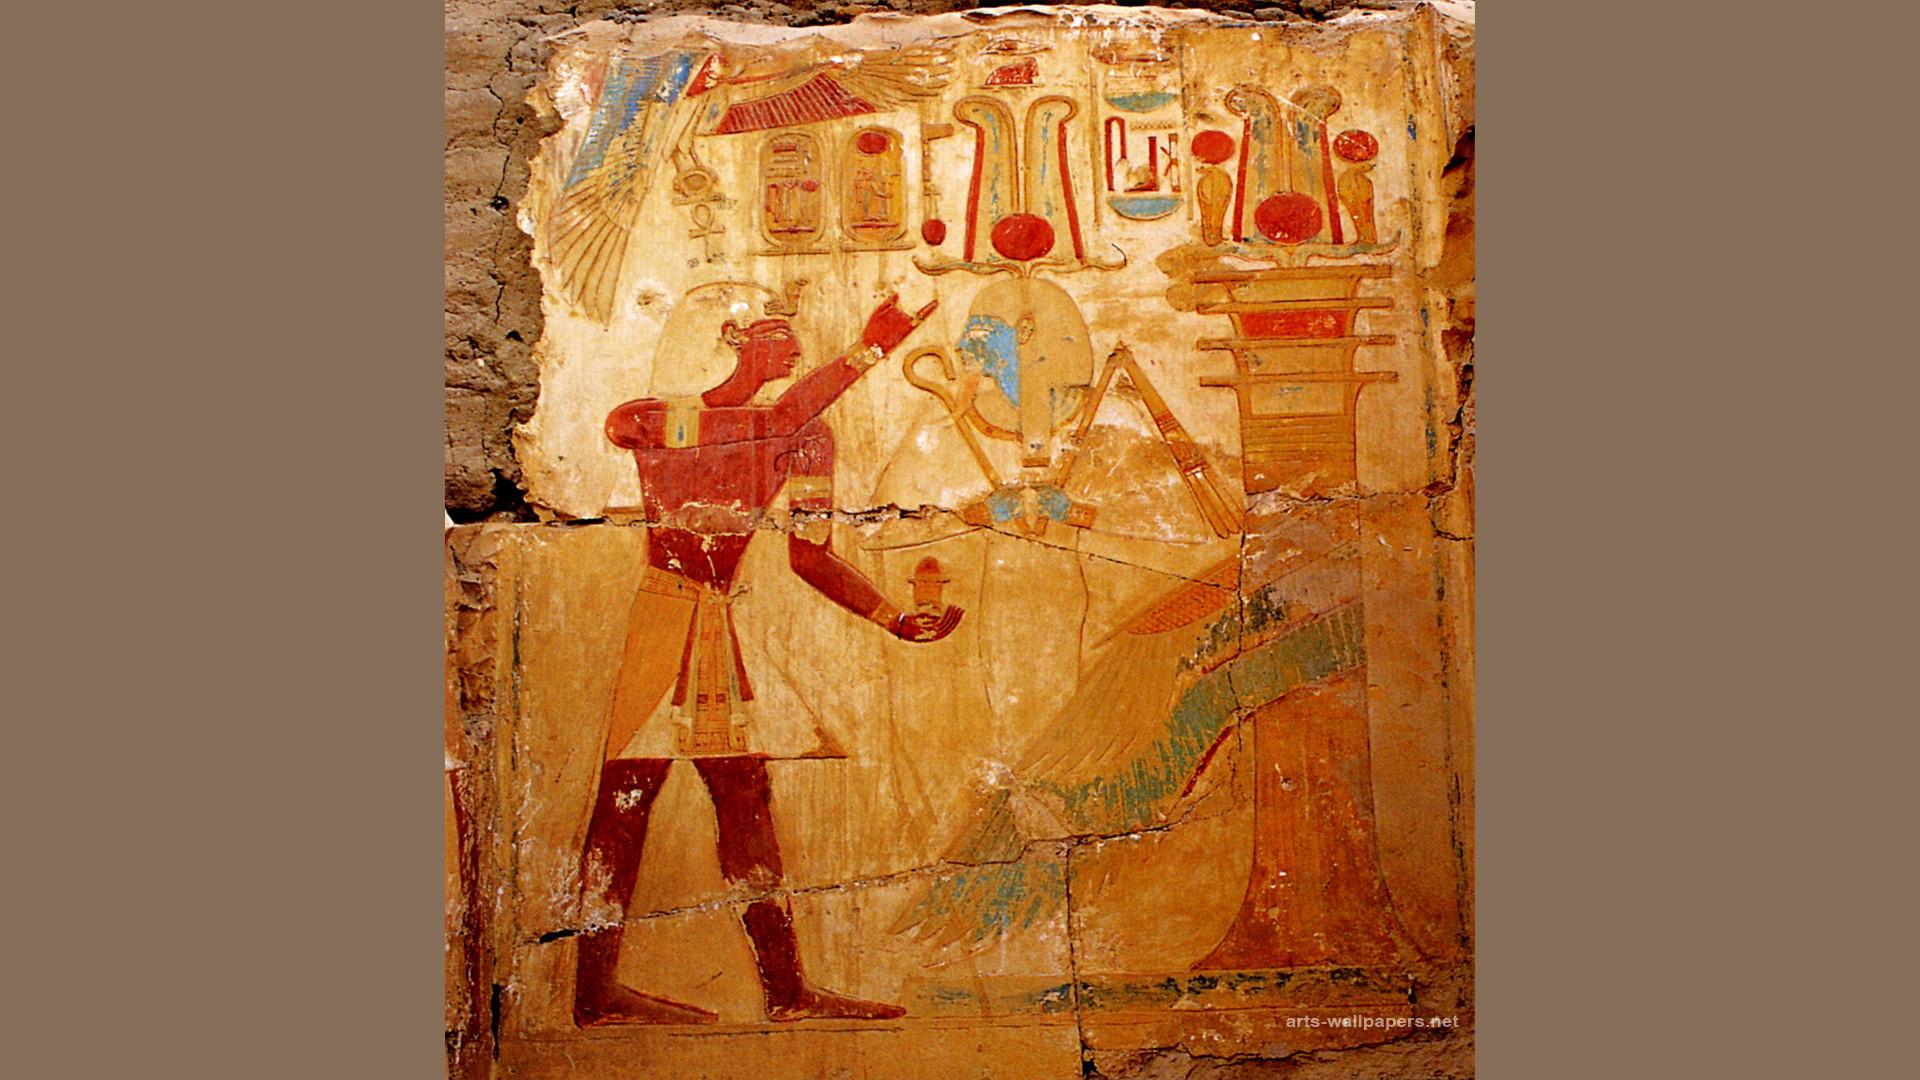 Hd Wallpapers Ancient Egypt Pharaohs 318 X 444 28 Kb Jpeg